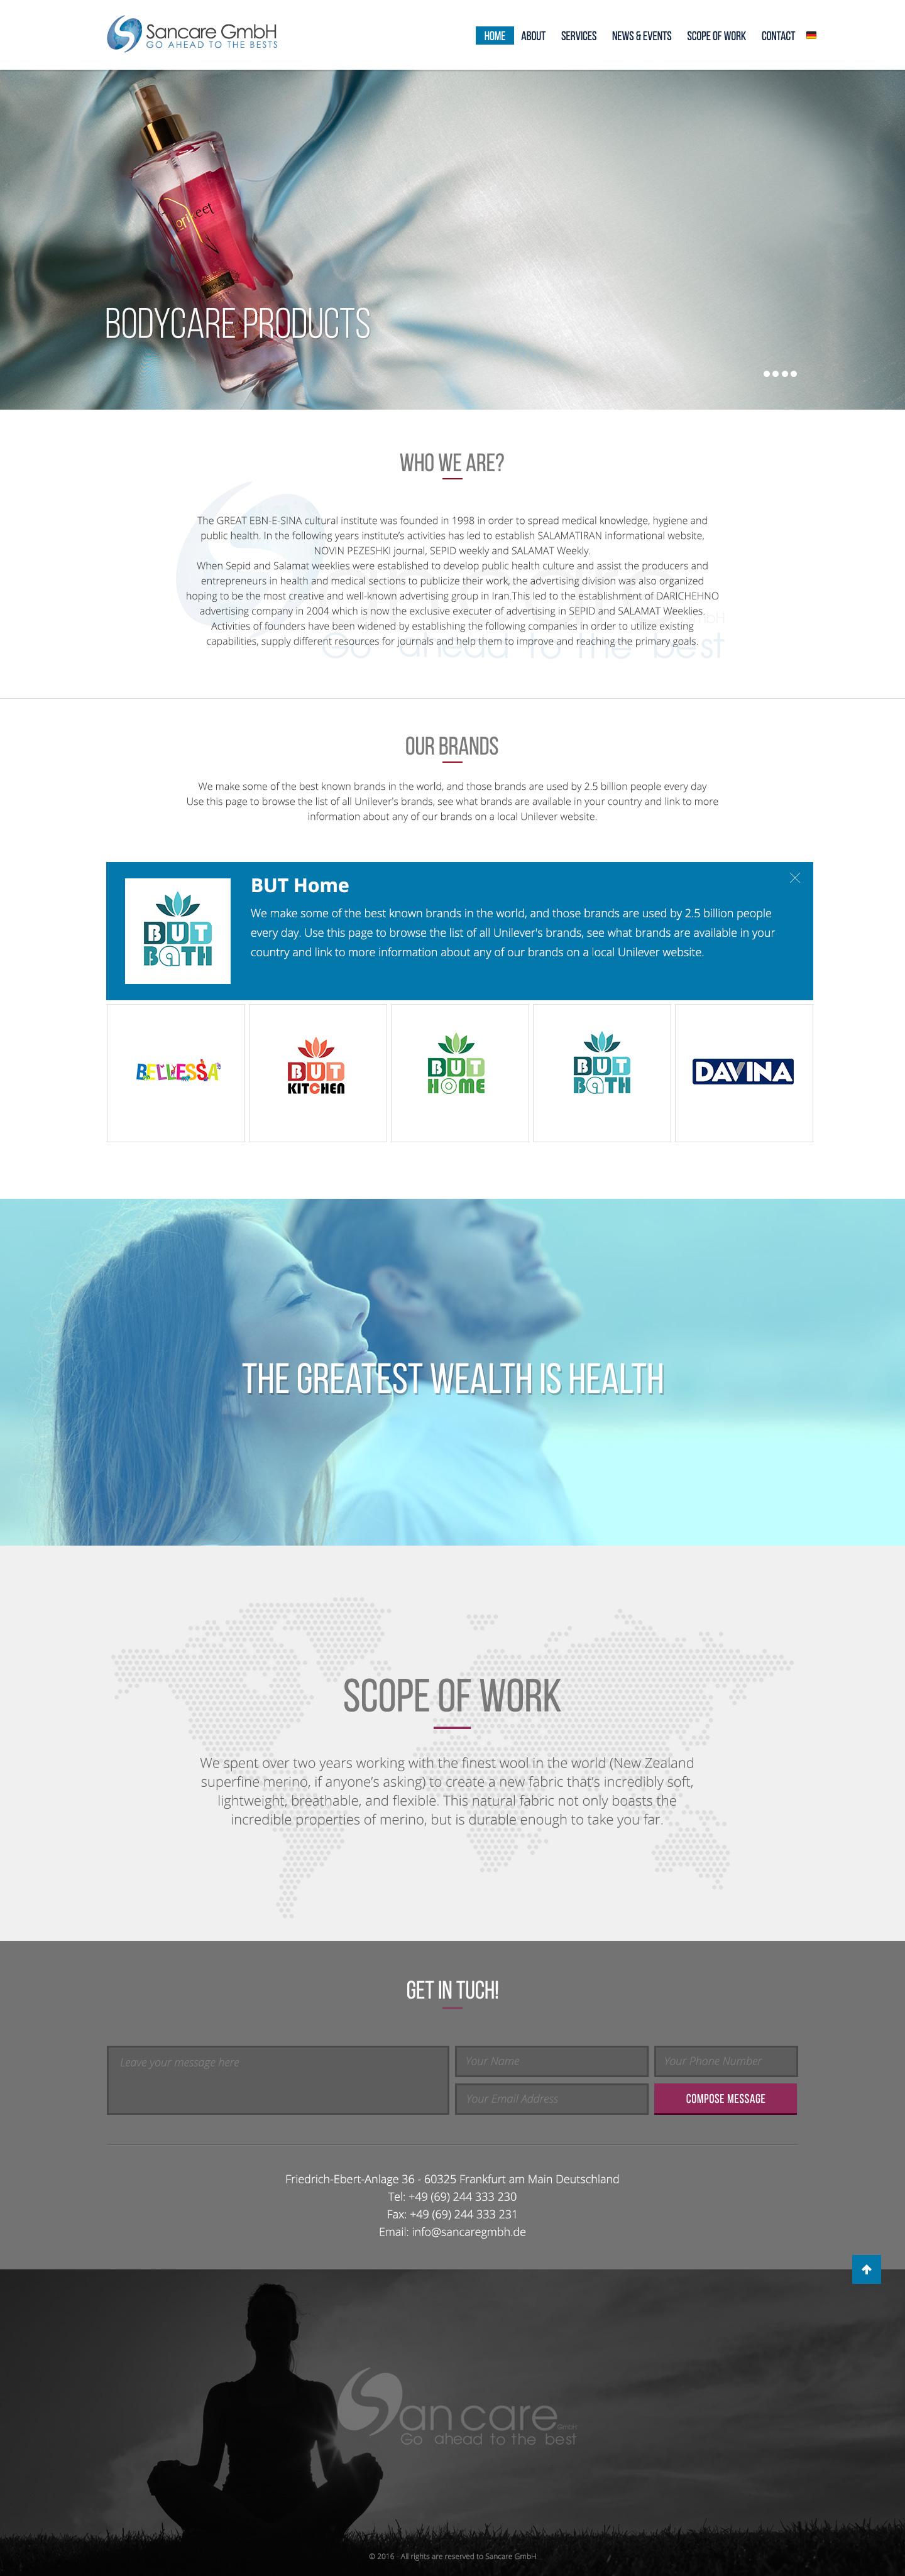 Sancare GmbH